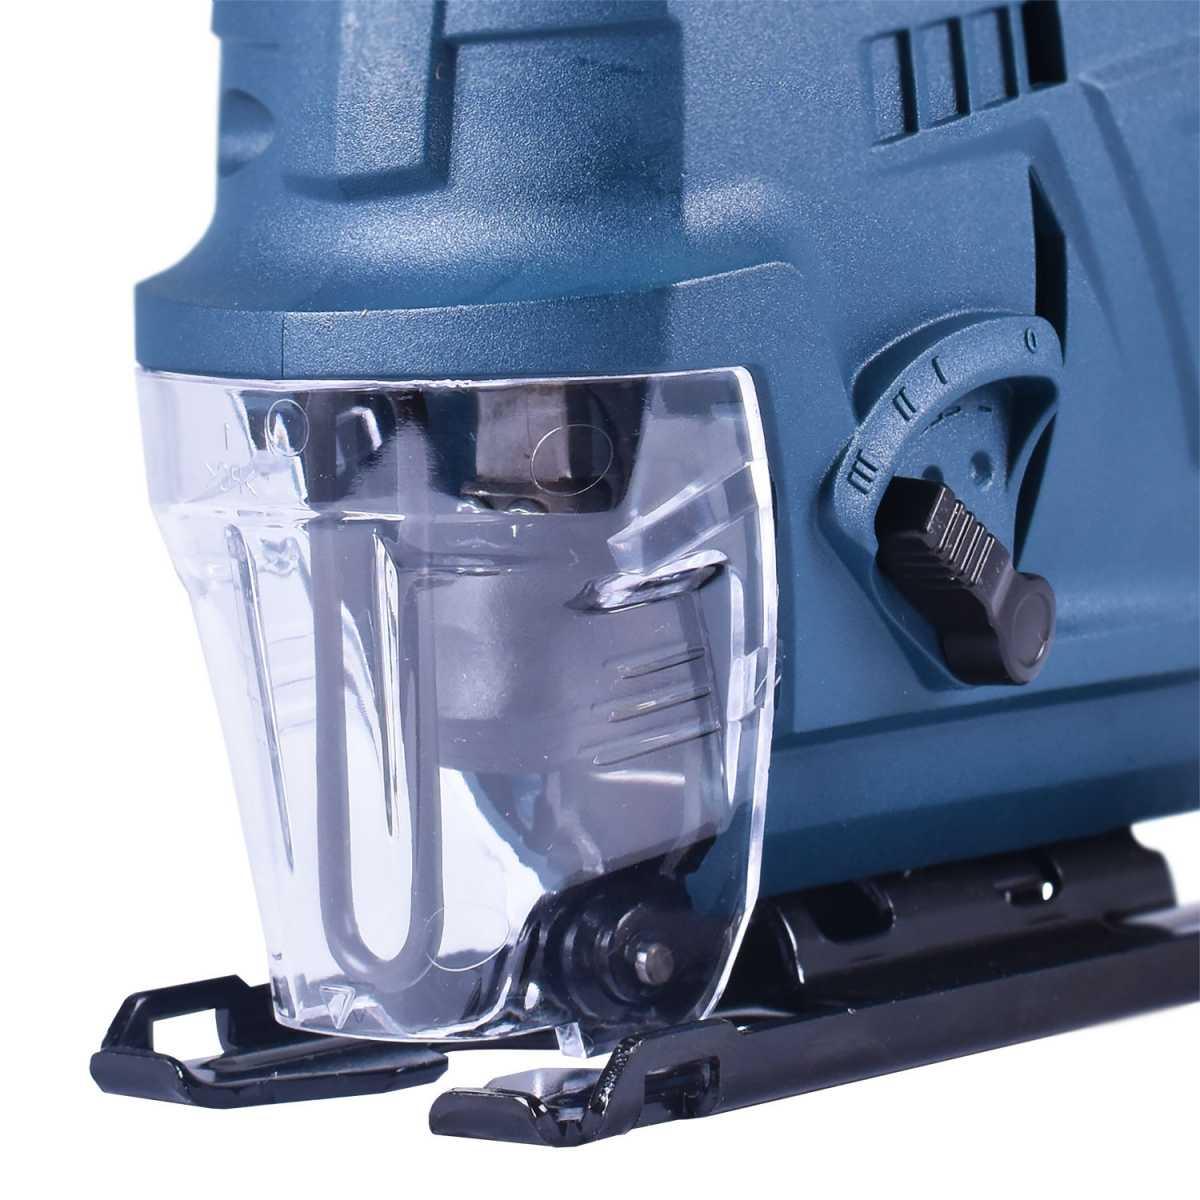 Serra Tico Tico Gst 700 c/500W 110v - Bosch